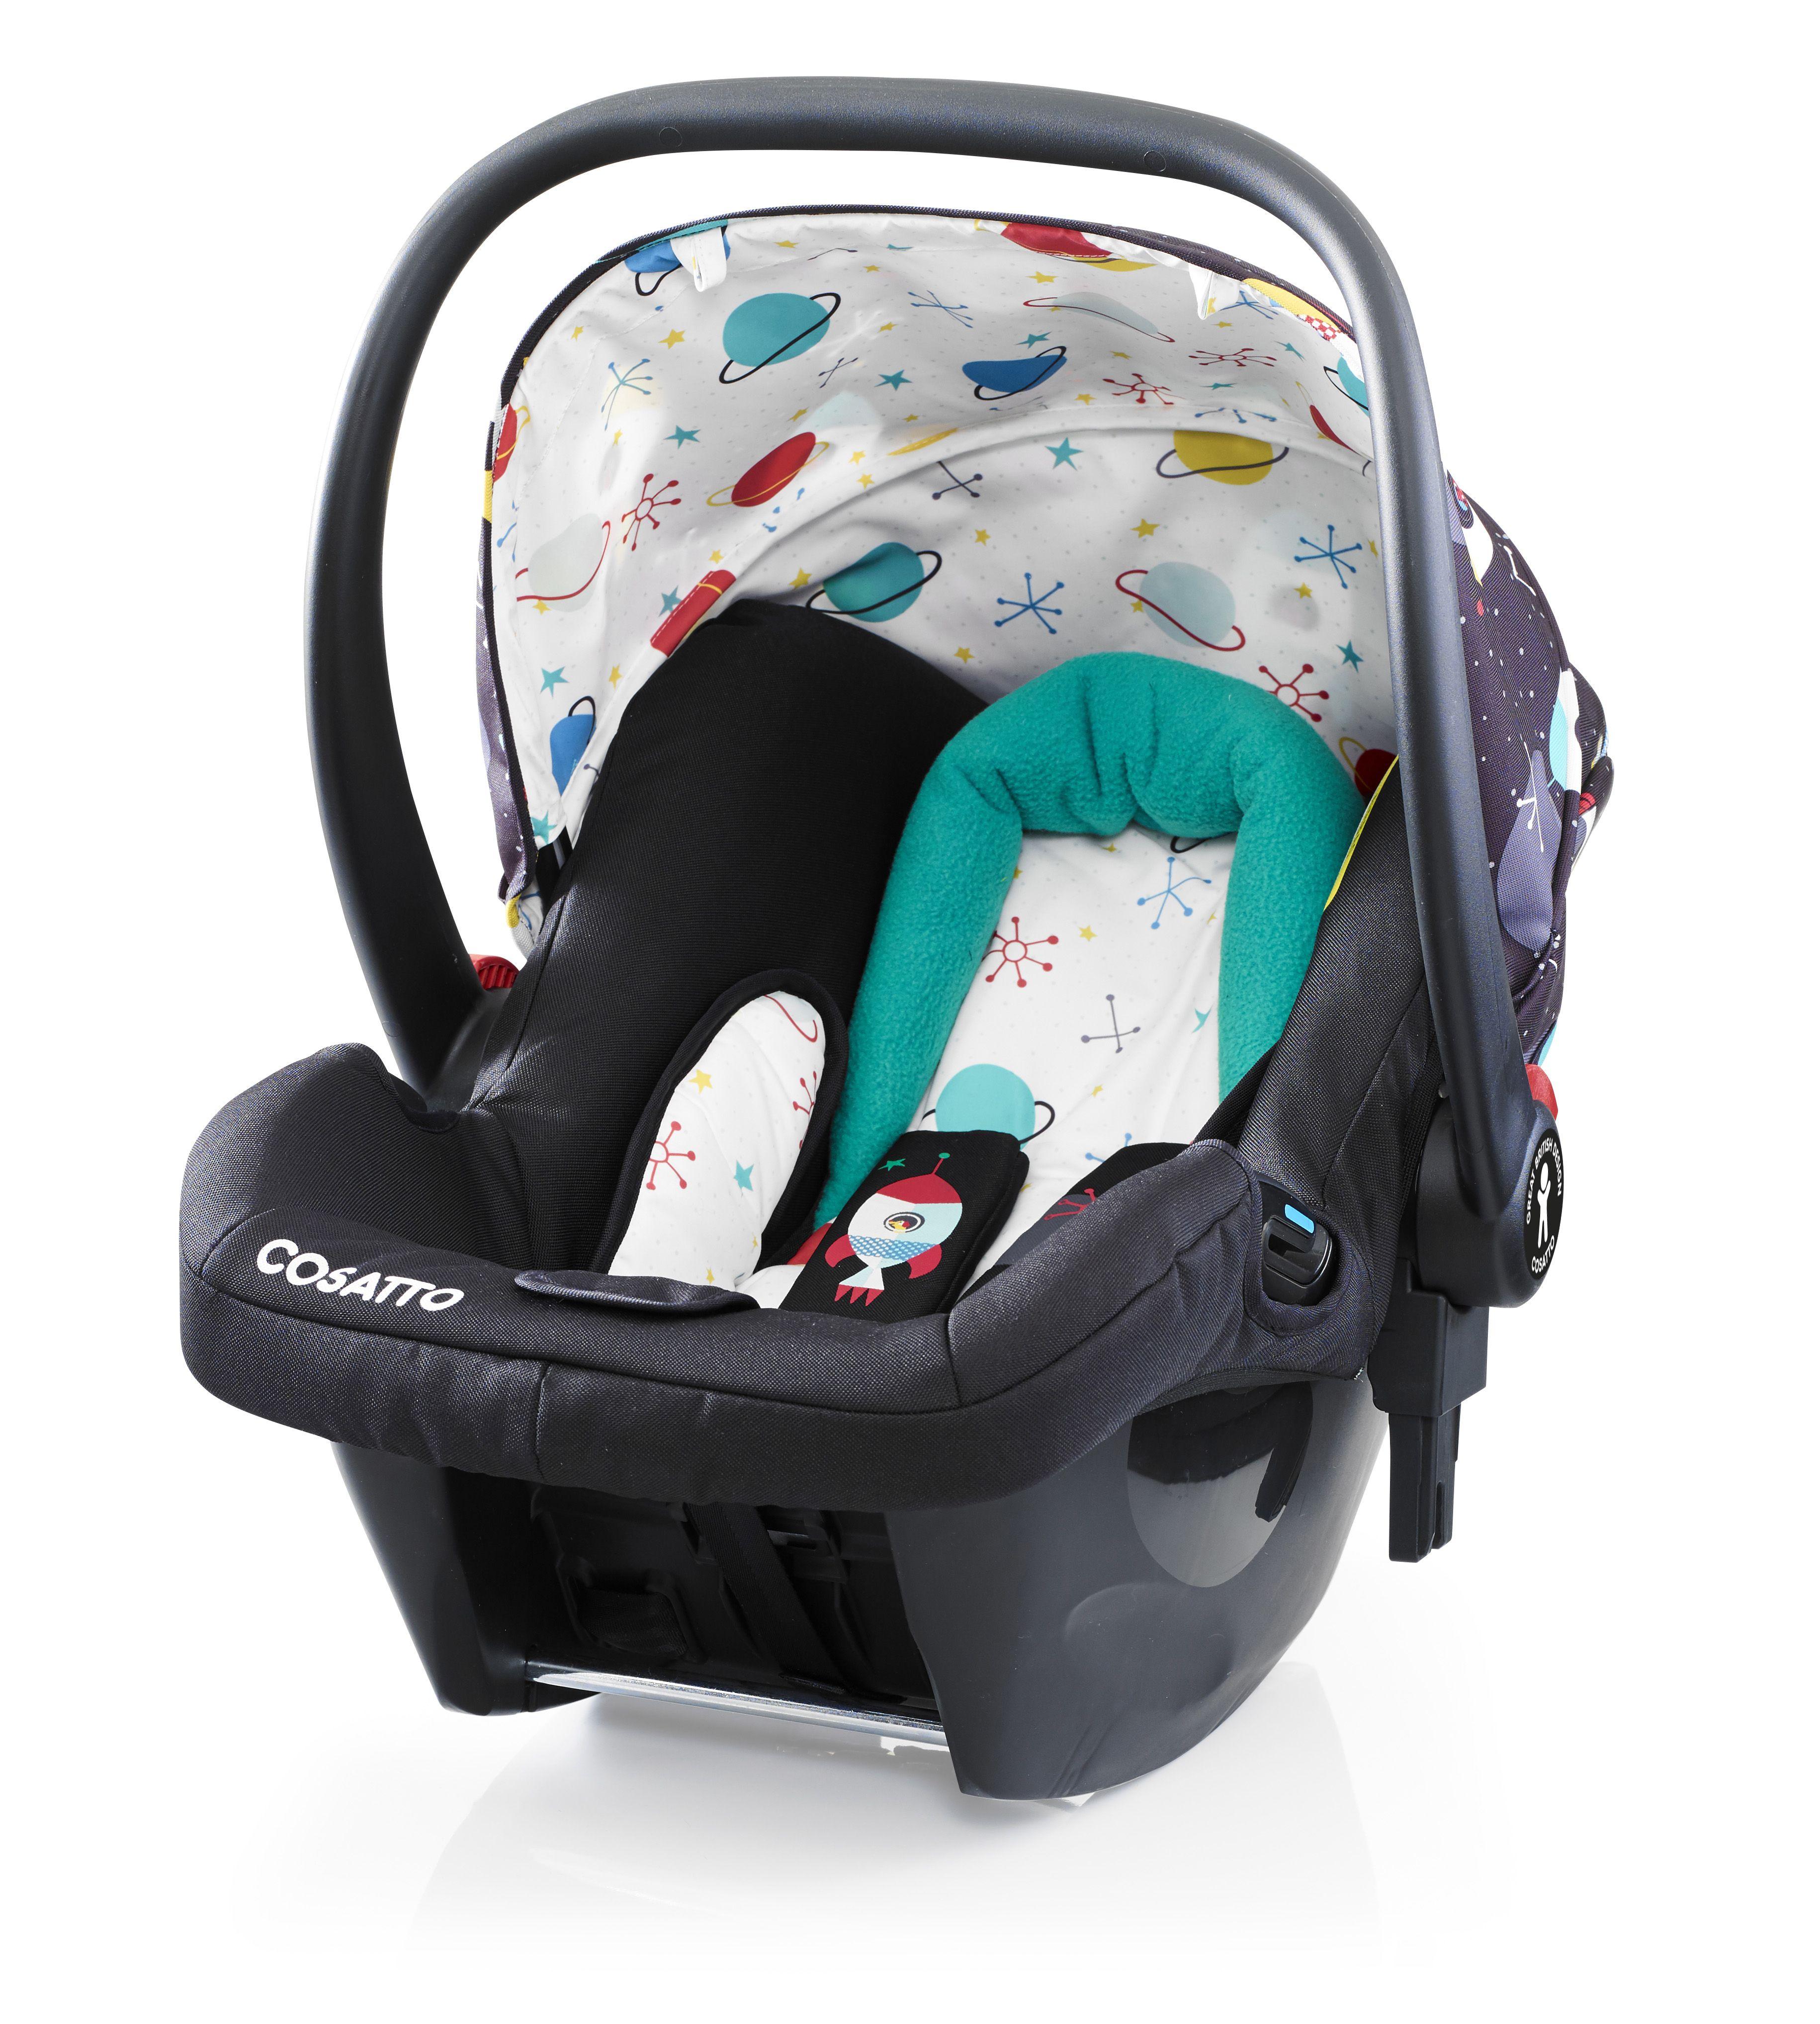 Toddler Car Seat Cheap Infant Seats Baby Uber